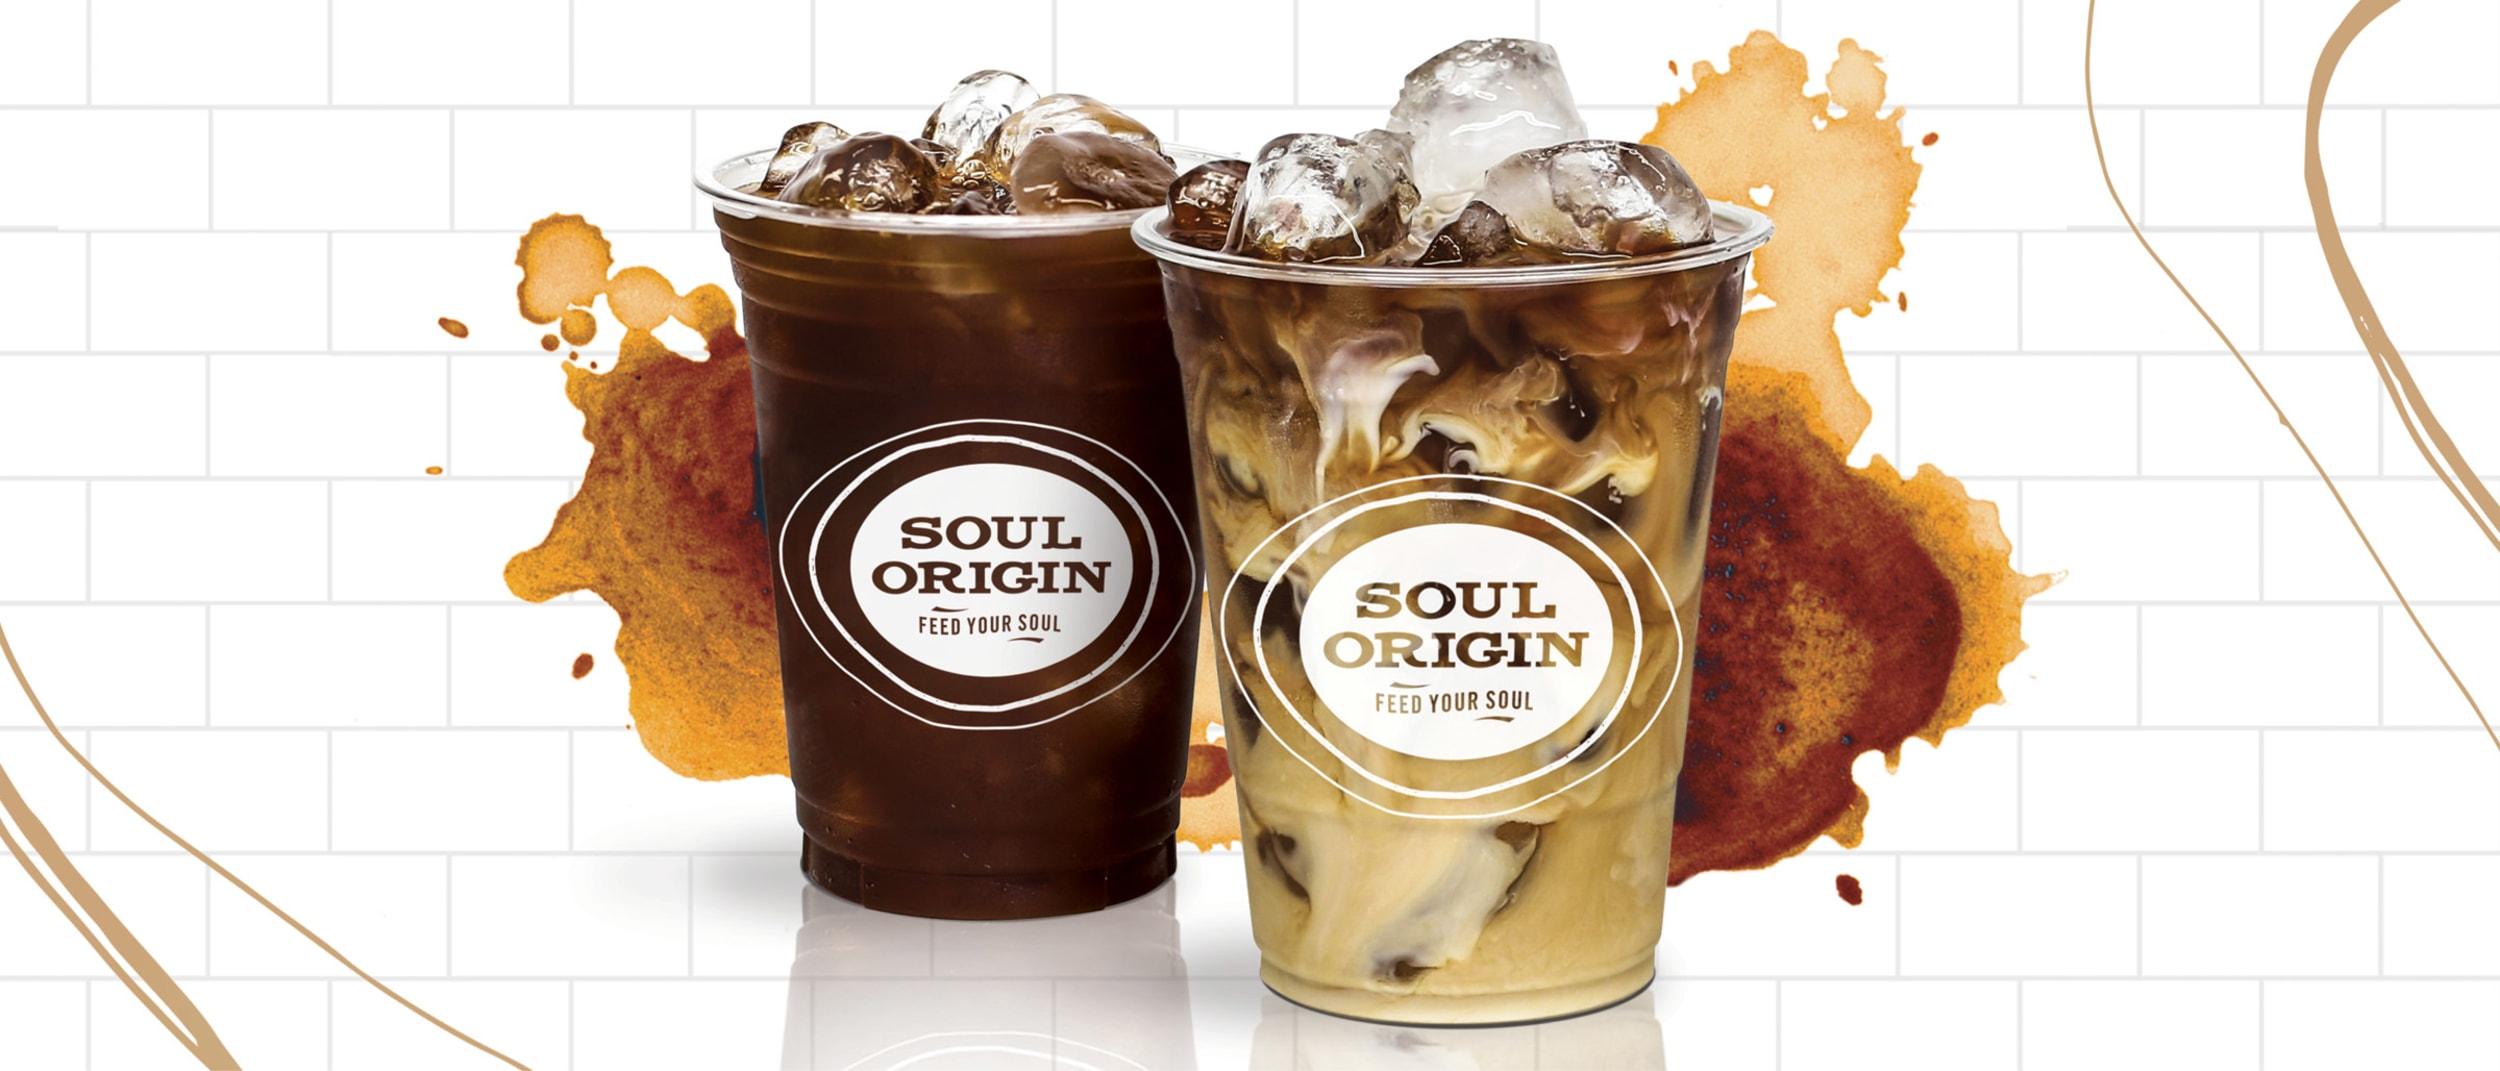 Soul Origin: get a taste of our new Cold Brew Range for $2